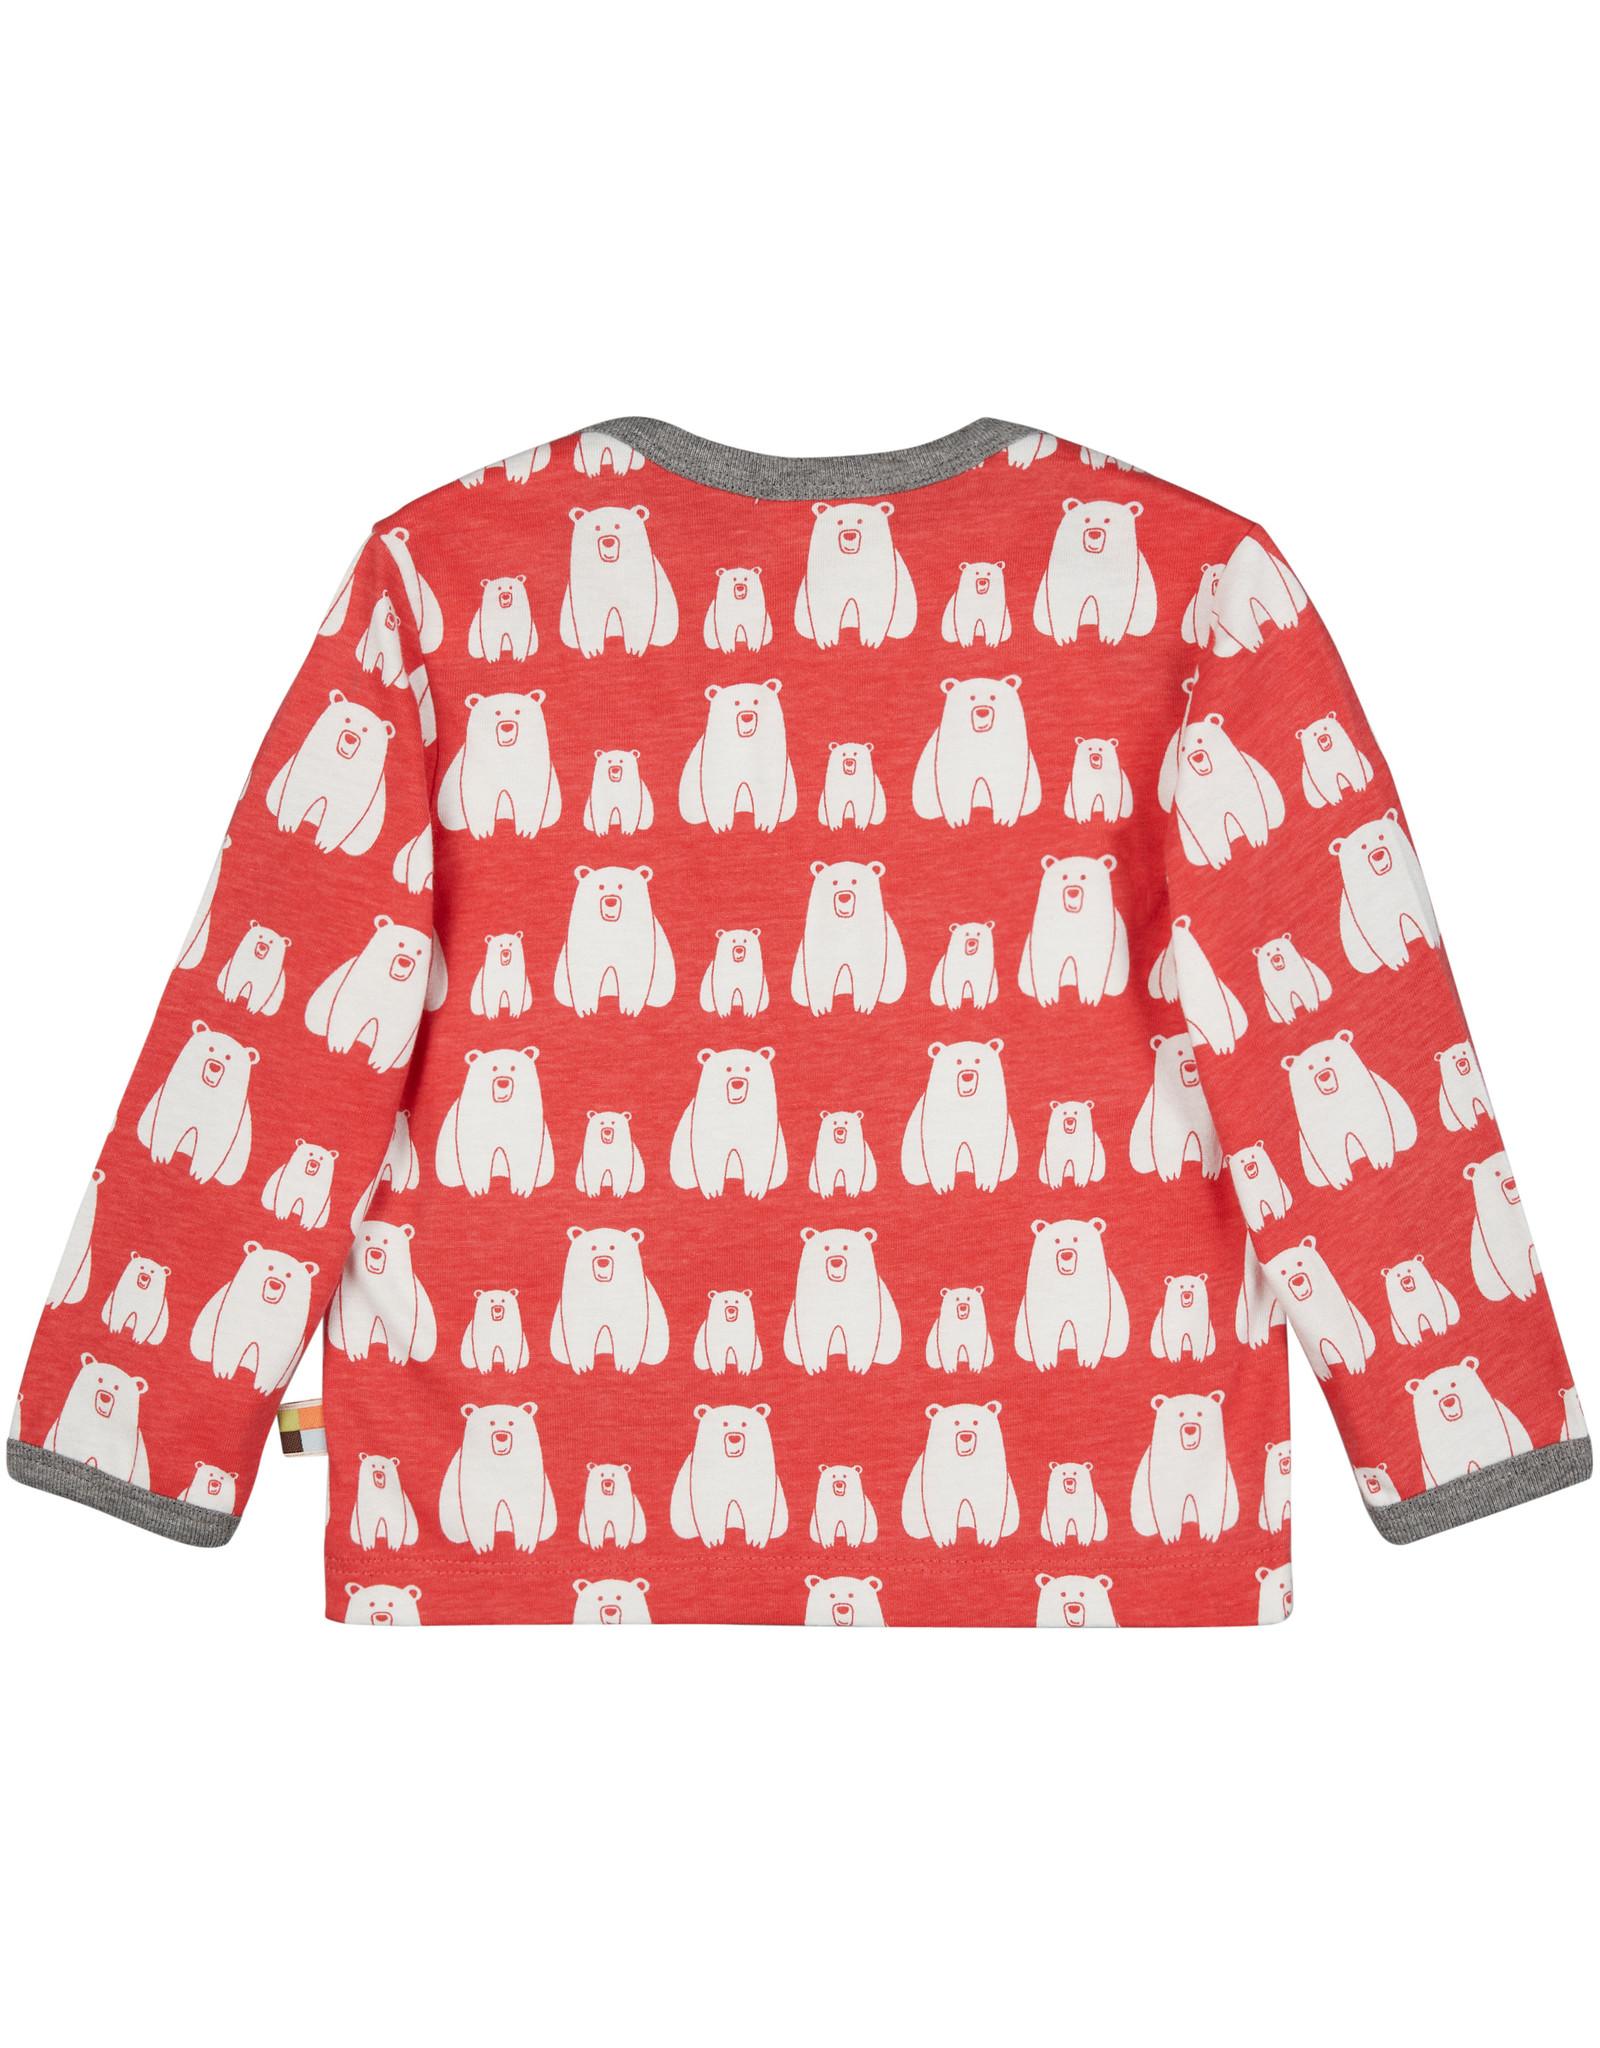 loud+proud Kids shirt - red polar bears